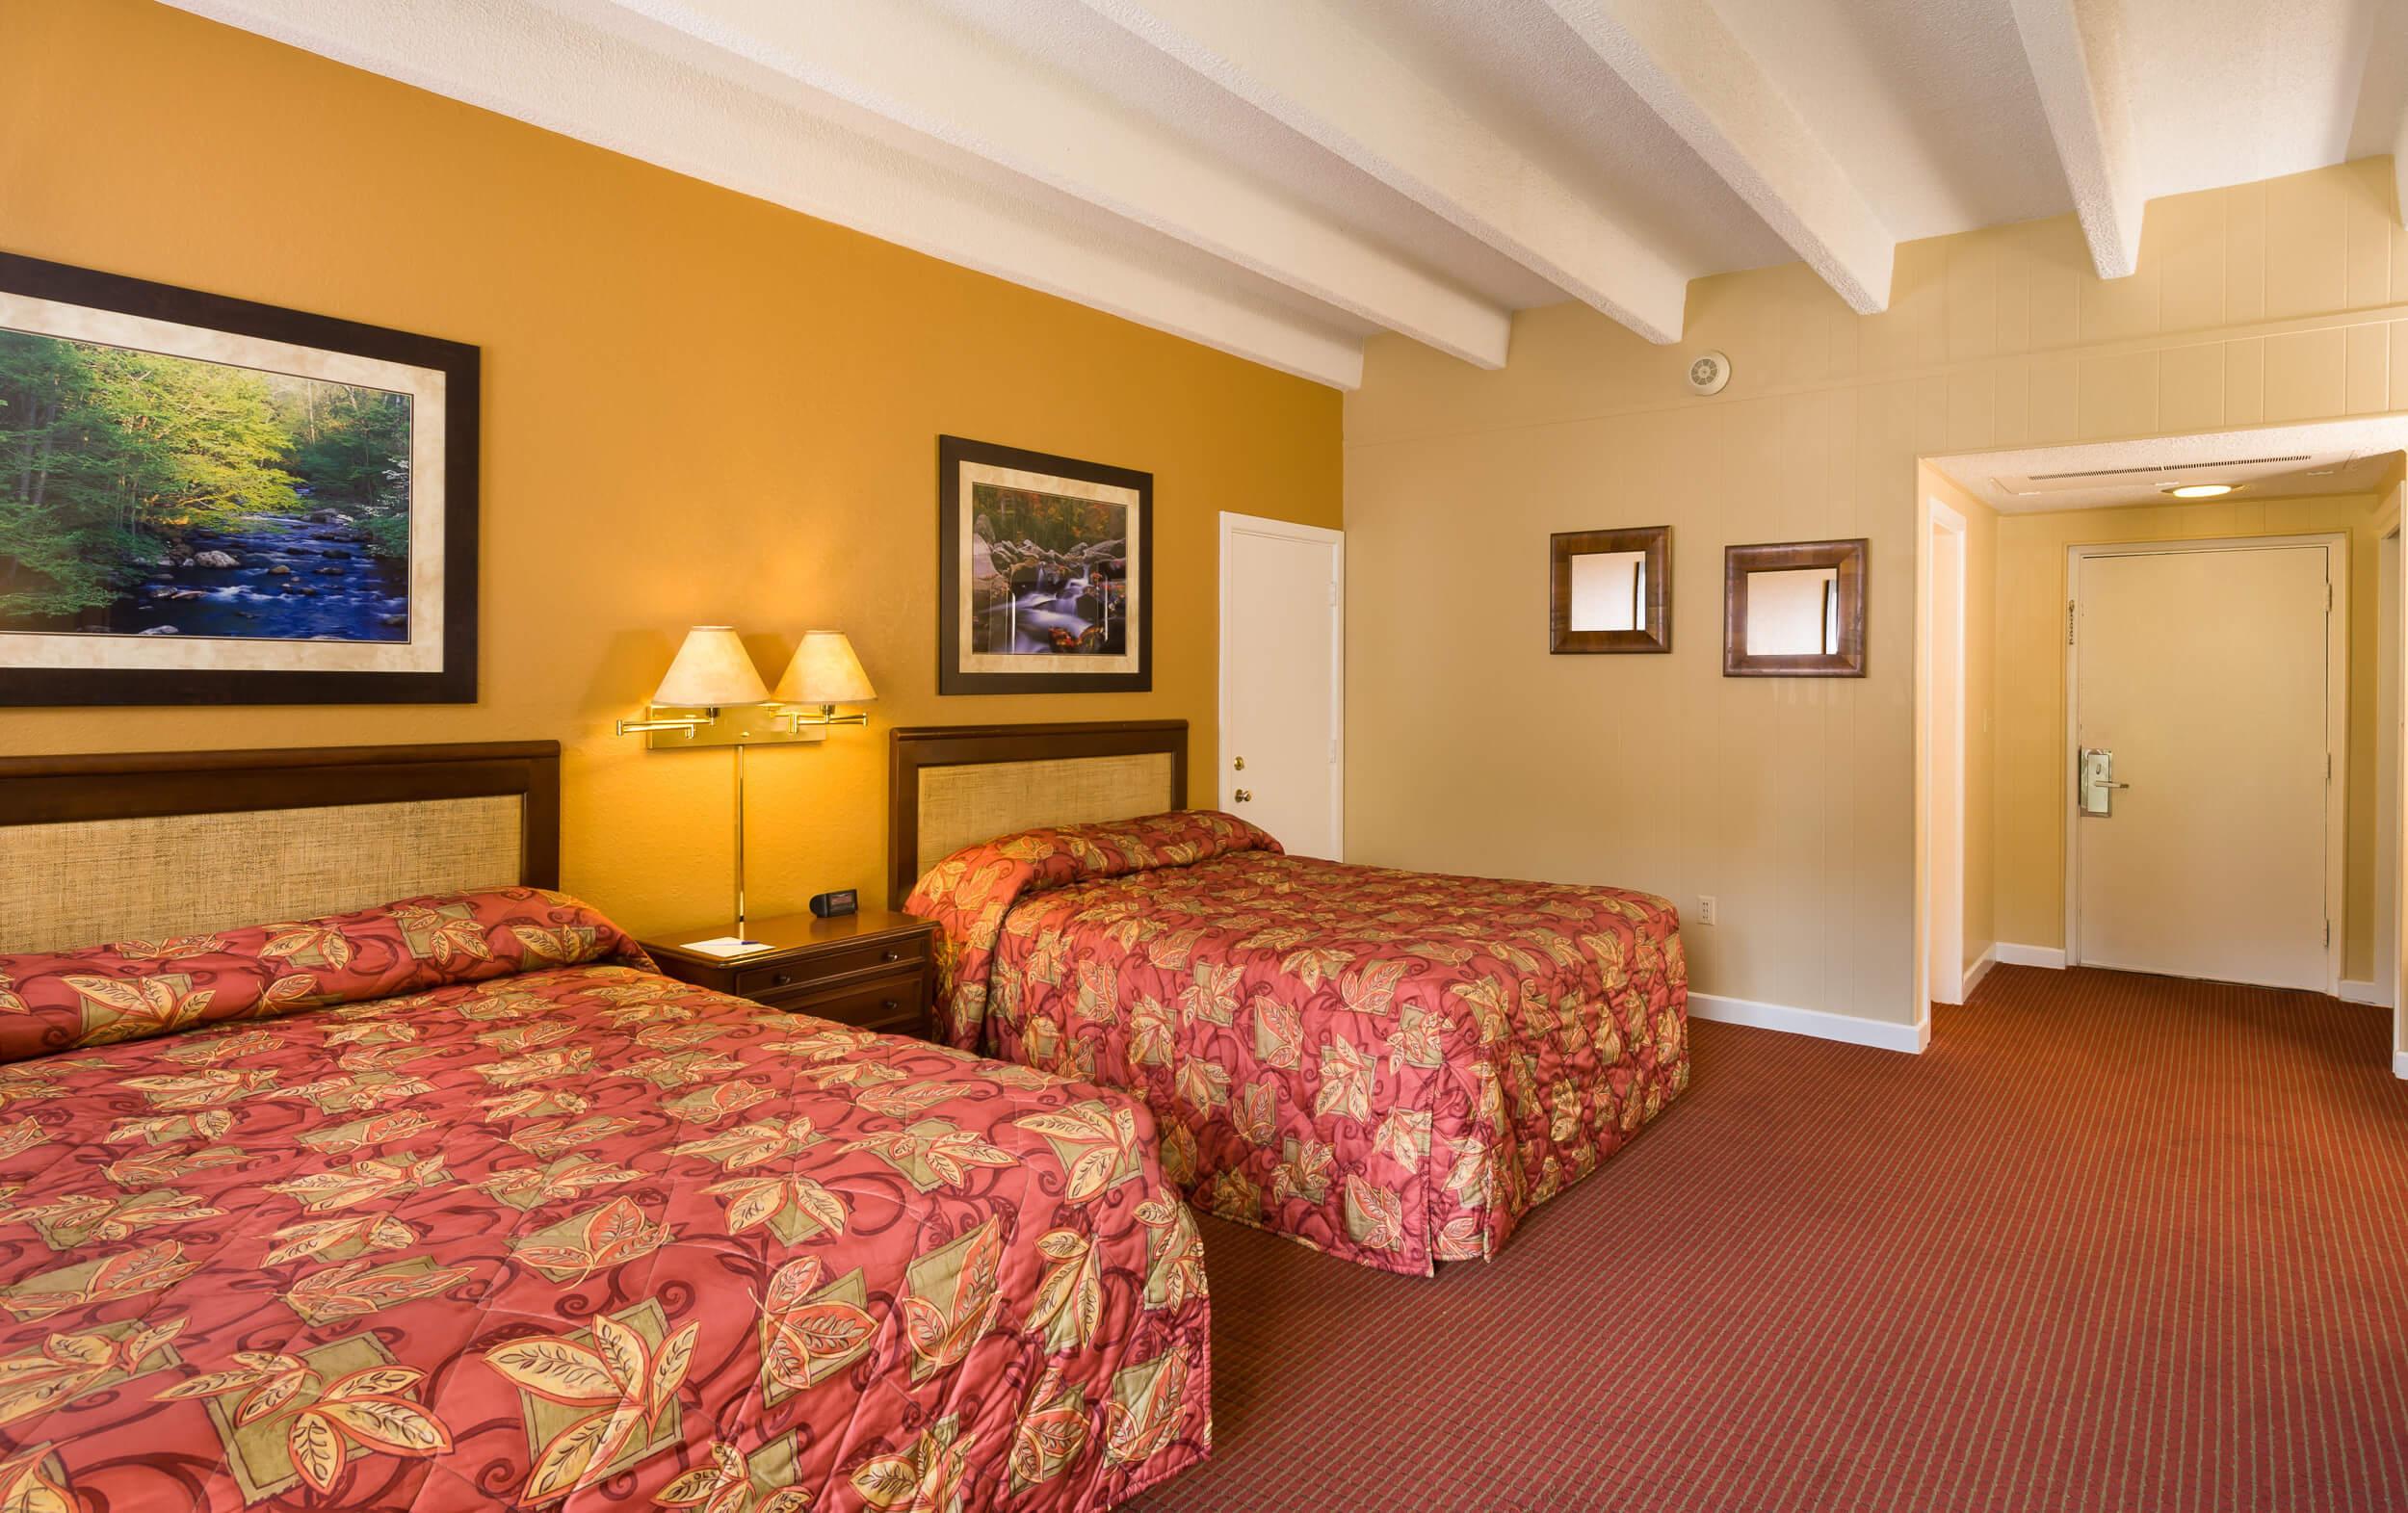 Standard Queen Room at our Gatlinburg Convention Center Hotel | River Terrace Resort & Convention Center | Westgate Resorts